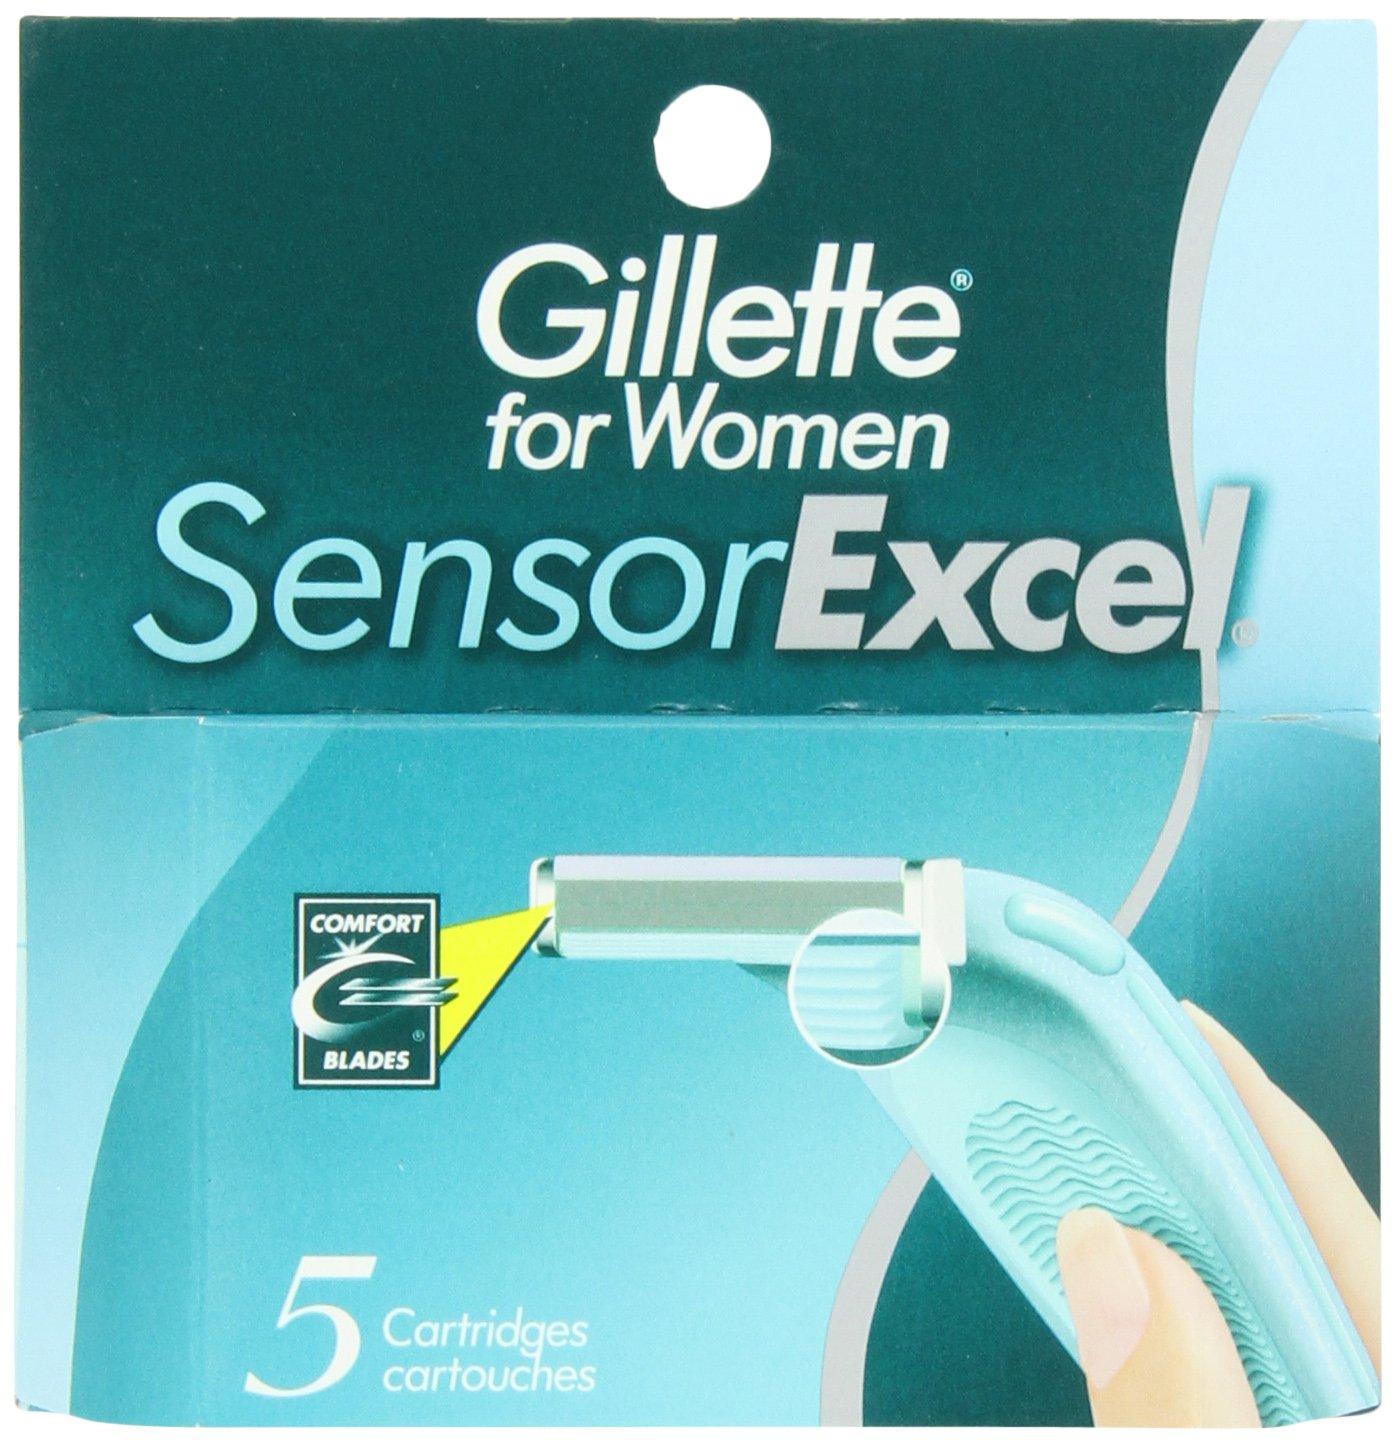 Gillette for Women SensorExcel Cartridges 5 ea P&G NA